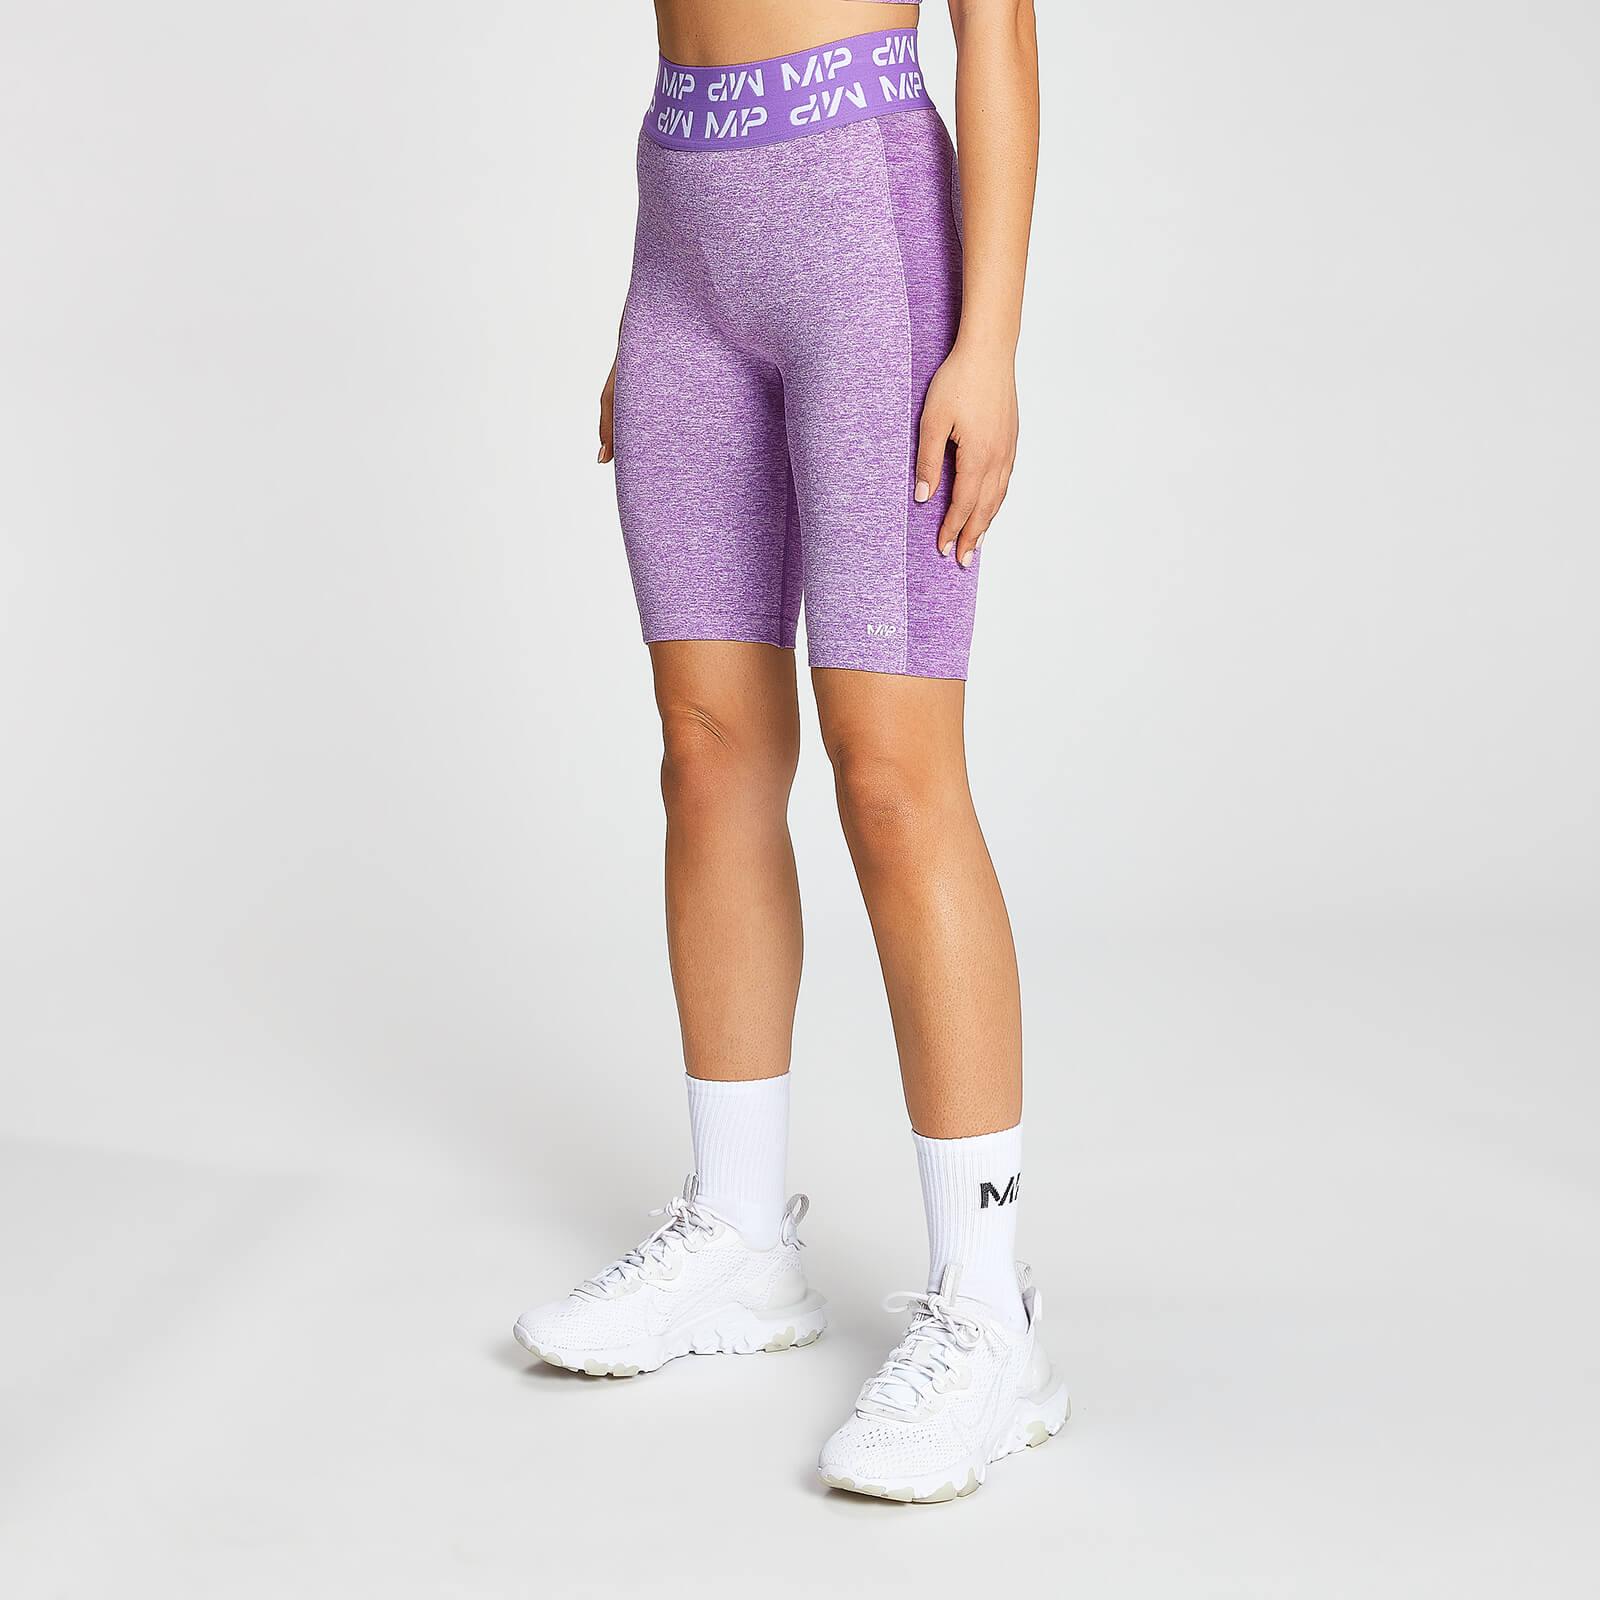 Купить MP Women's Curve Cycling Shorts - Deep Lilac - S, Myprotein International